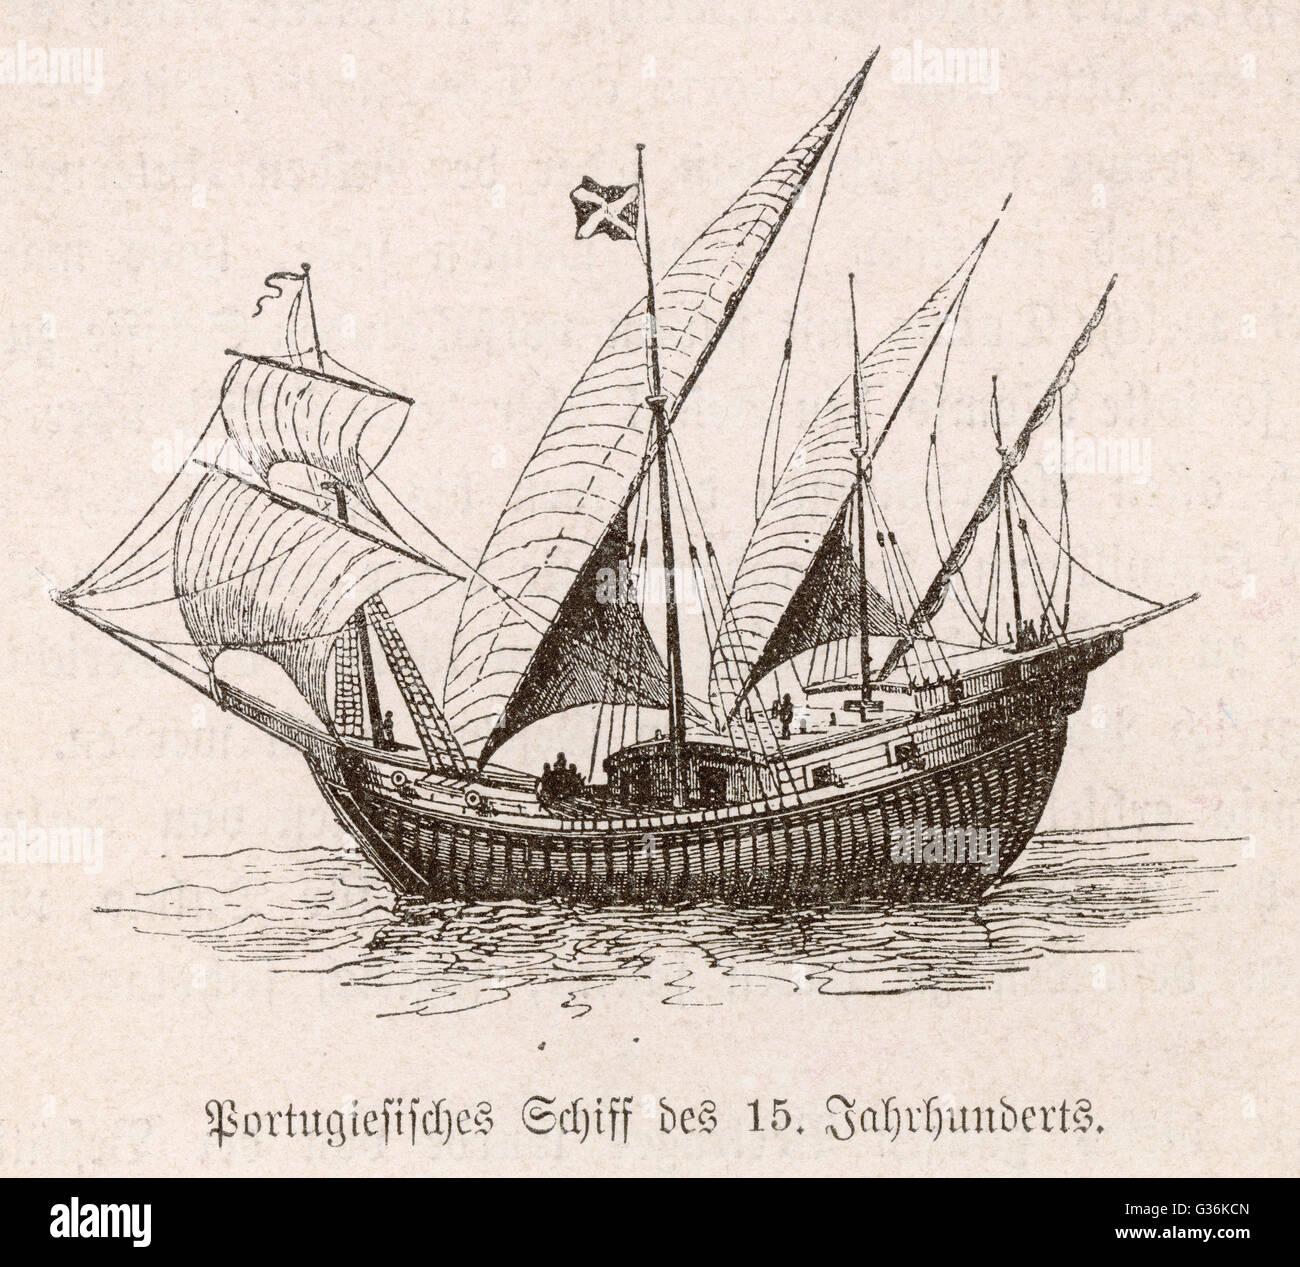 Portuguese caravel          Date: 15th century - Stock Image